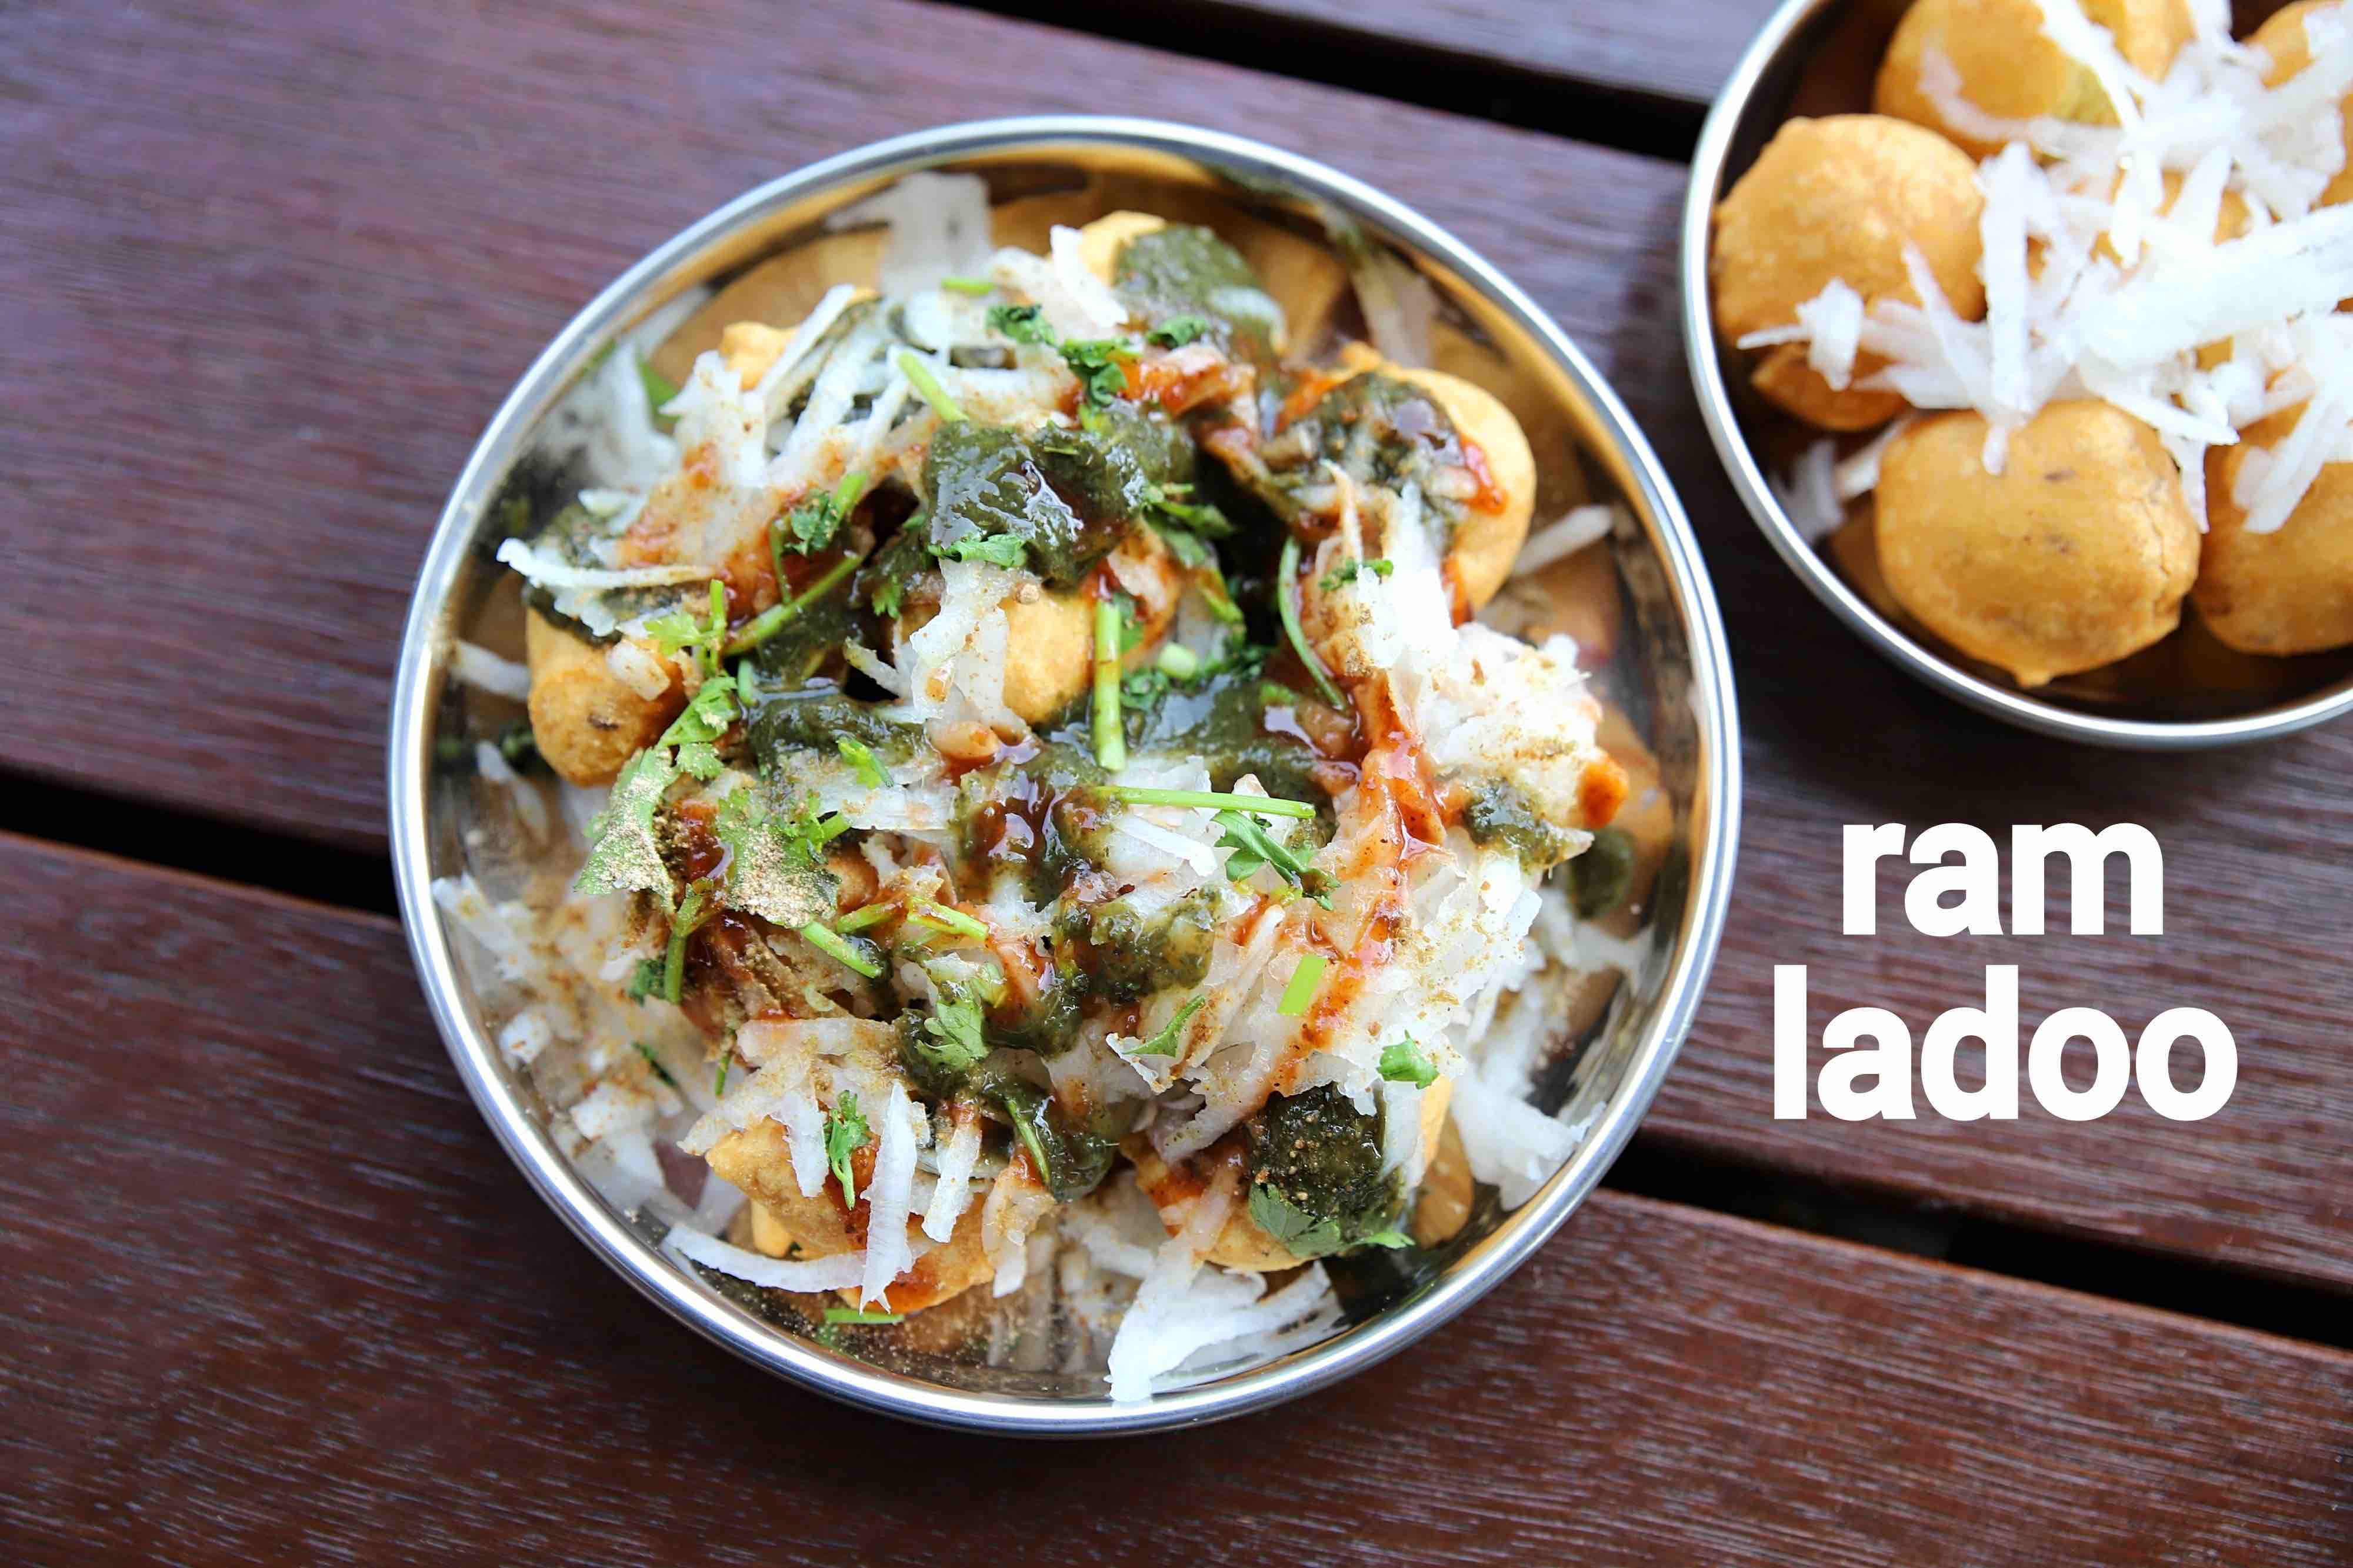 ram ladoo recipe | ram laddu recipe | ram laddu banane ki vidhi